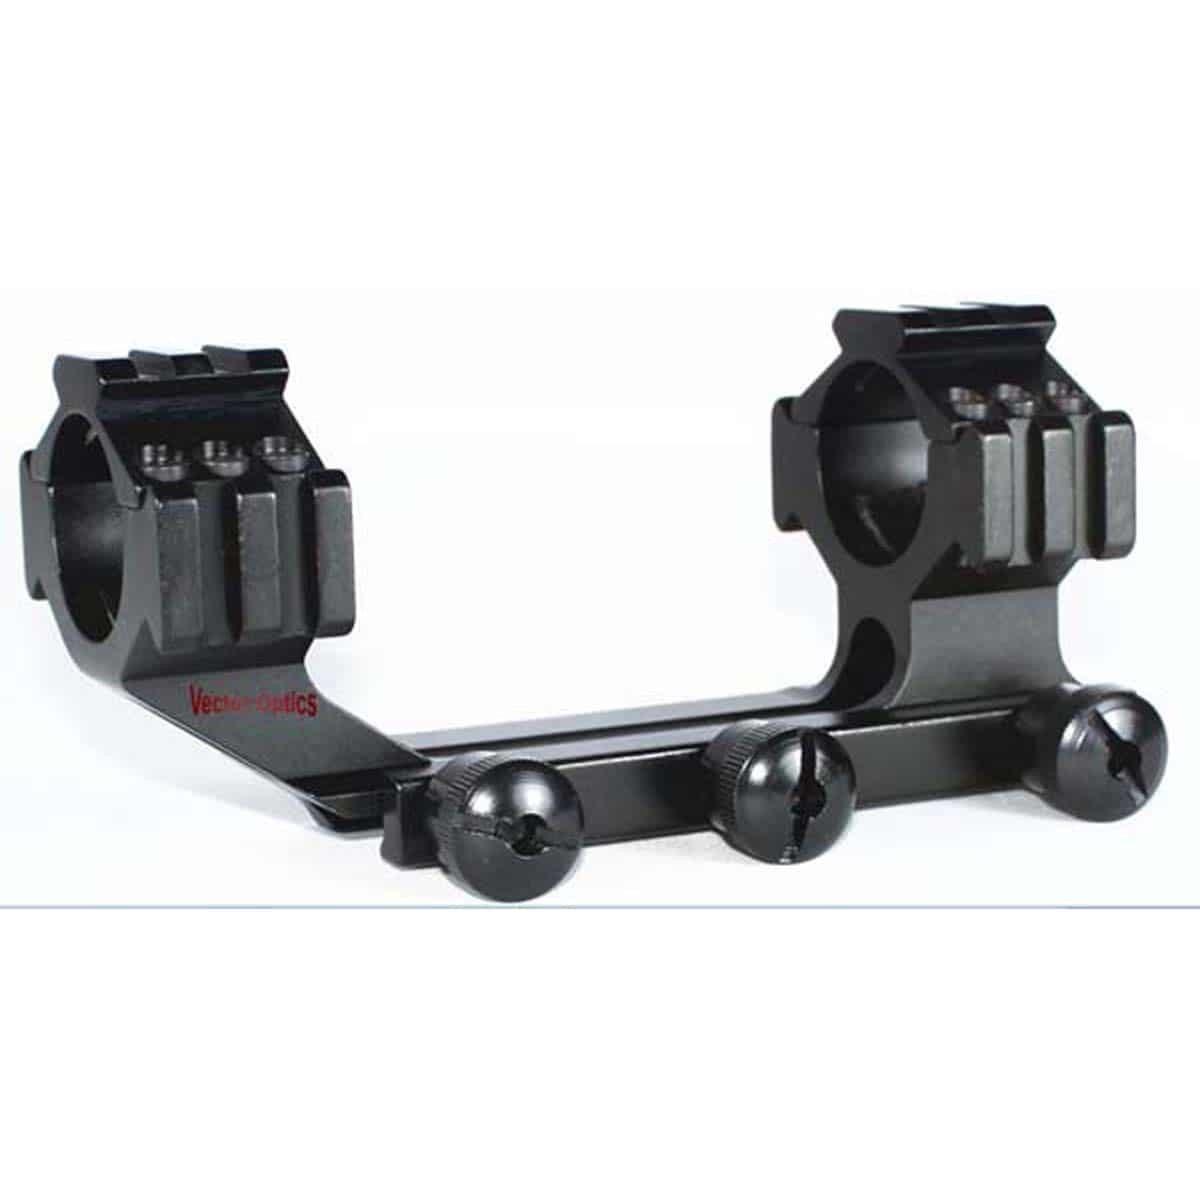 Suporte para luneta Vector Optics Hydra 30mm OnePiece Tactial Tri-Rail Longo